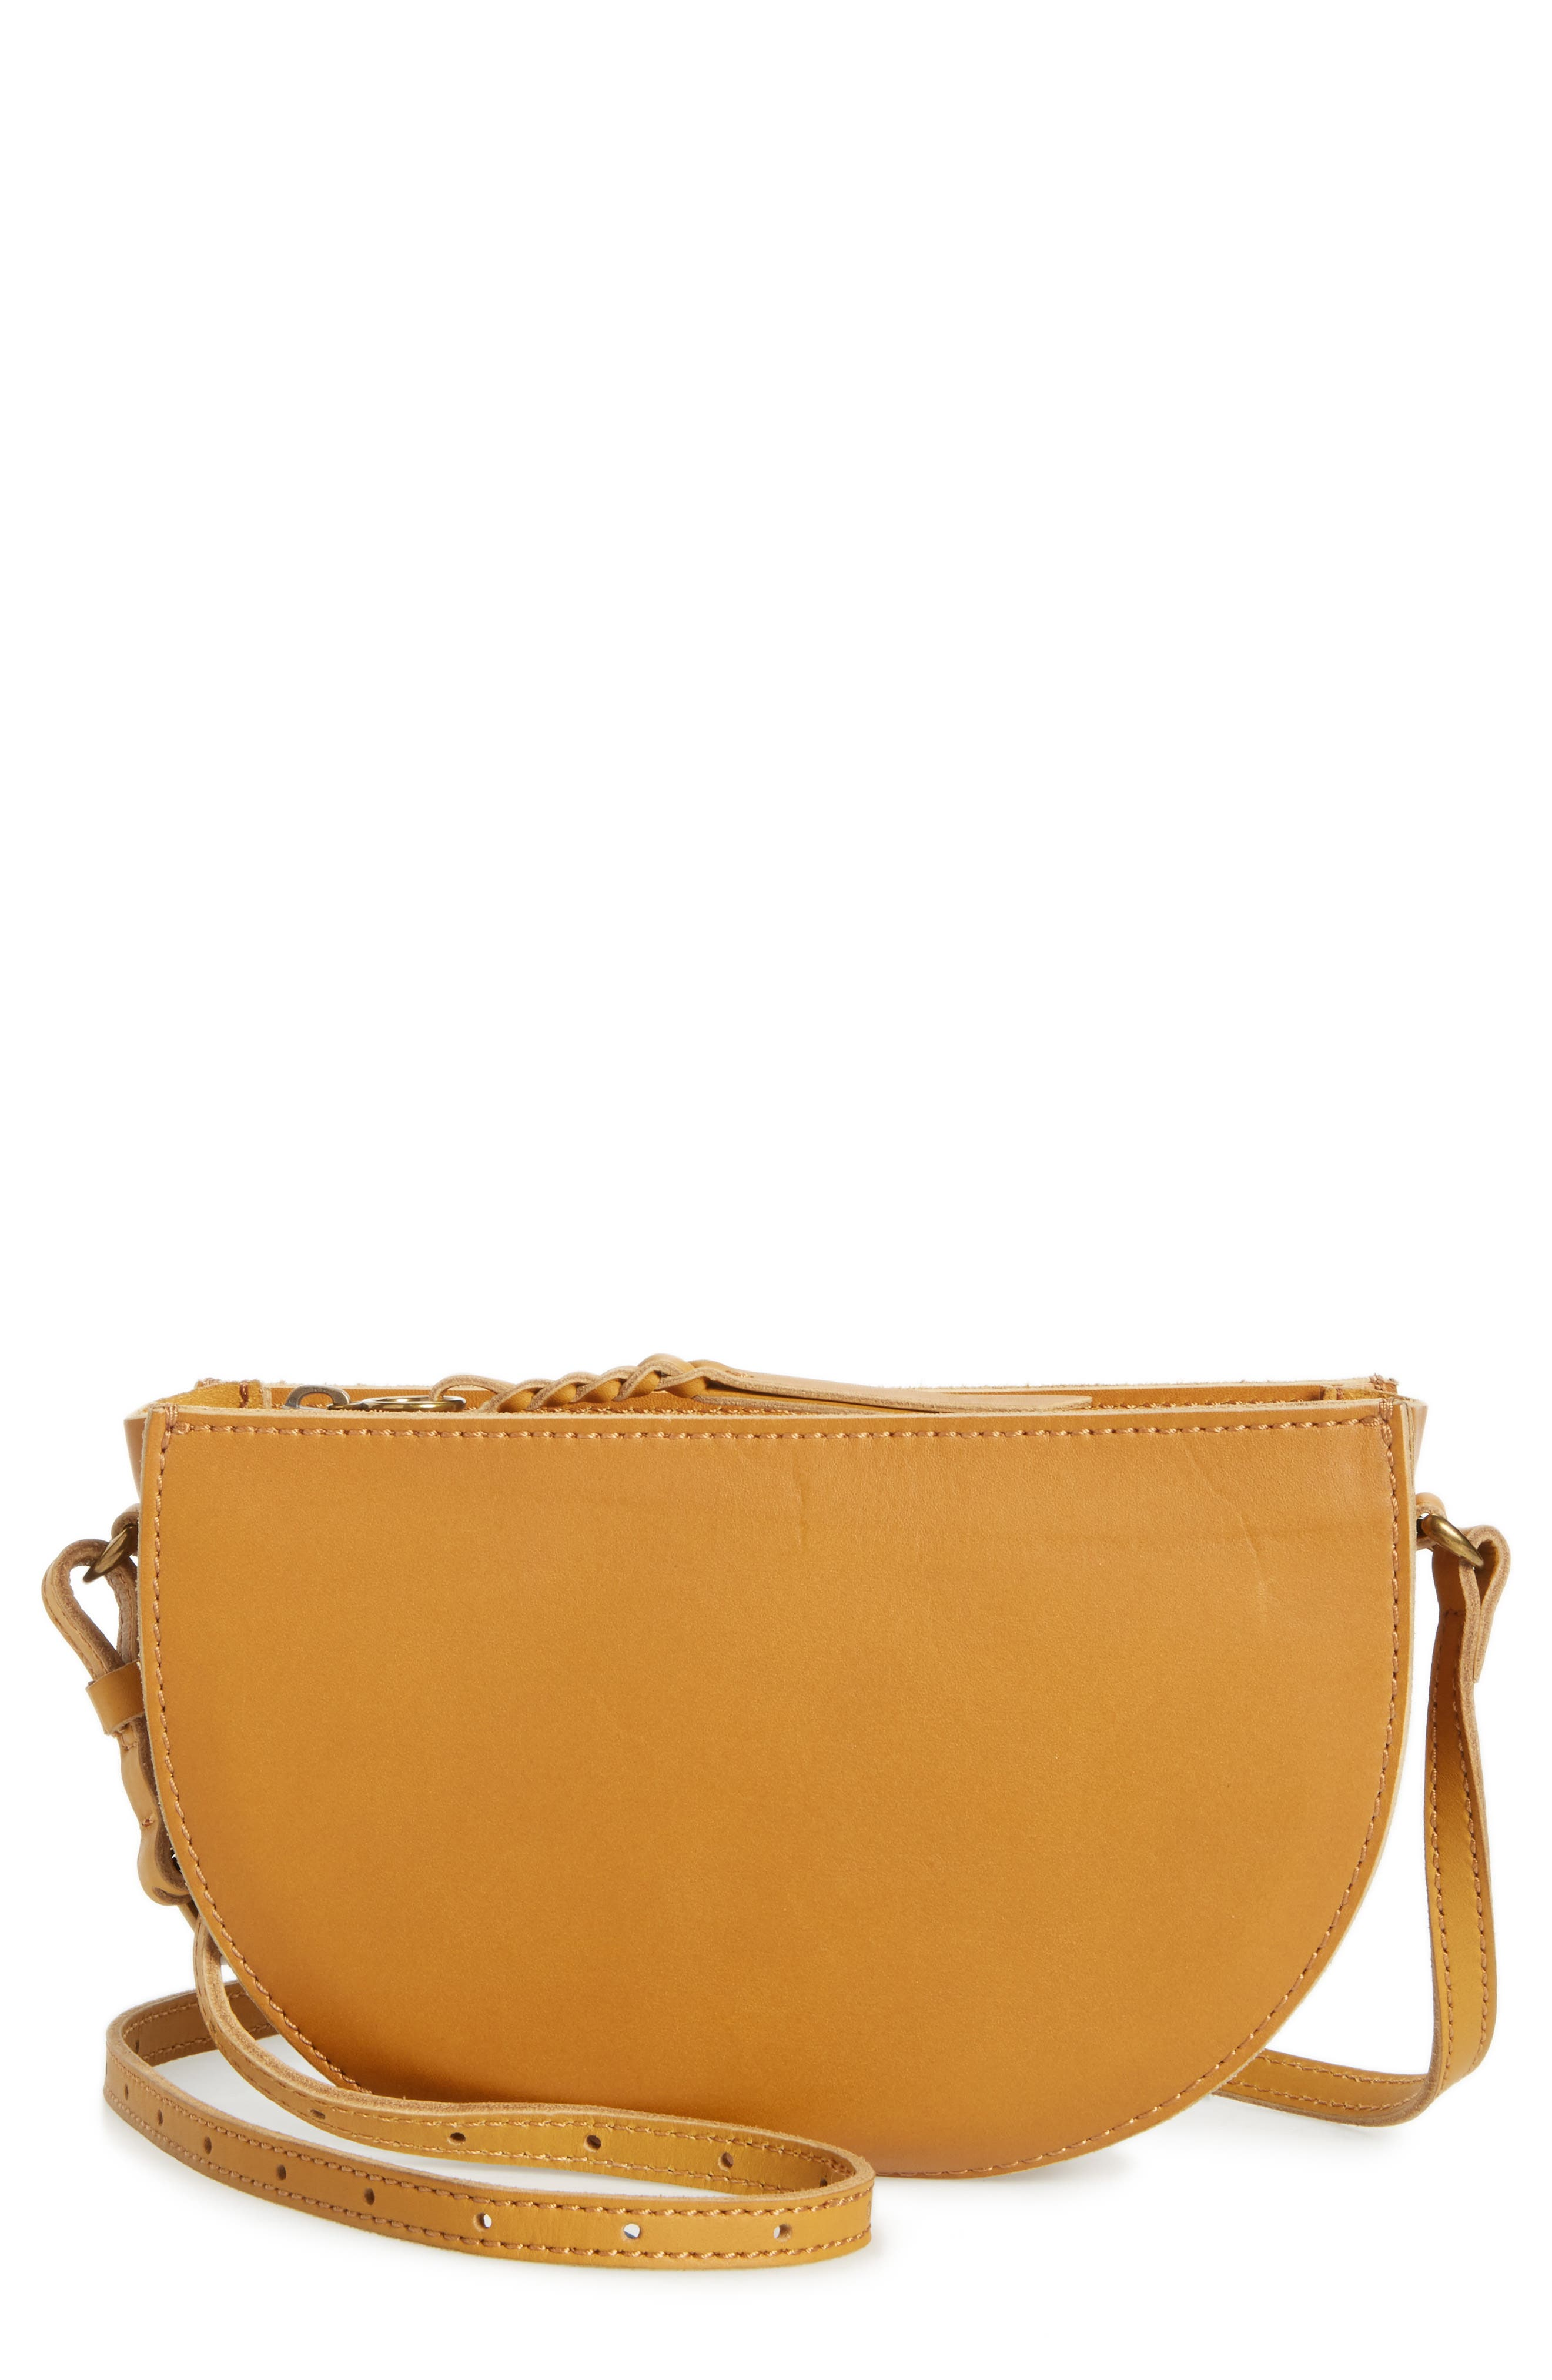 Main Image - Madewell Juniper Vachetta Leather Half Moon Crossbody Bag